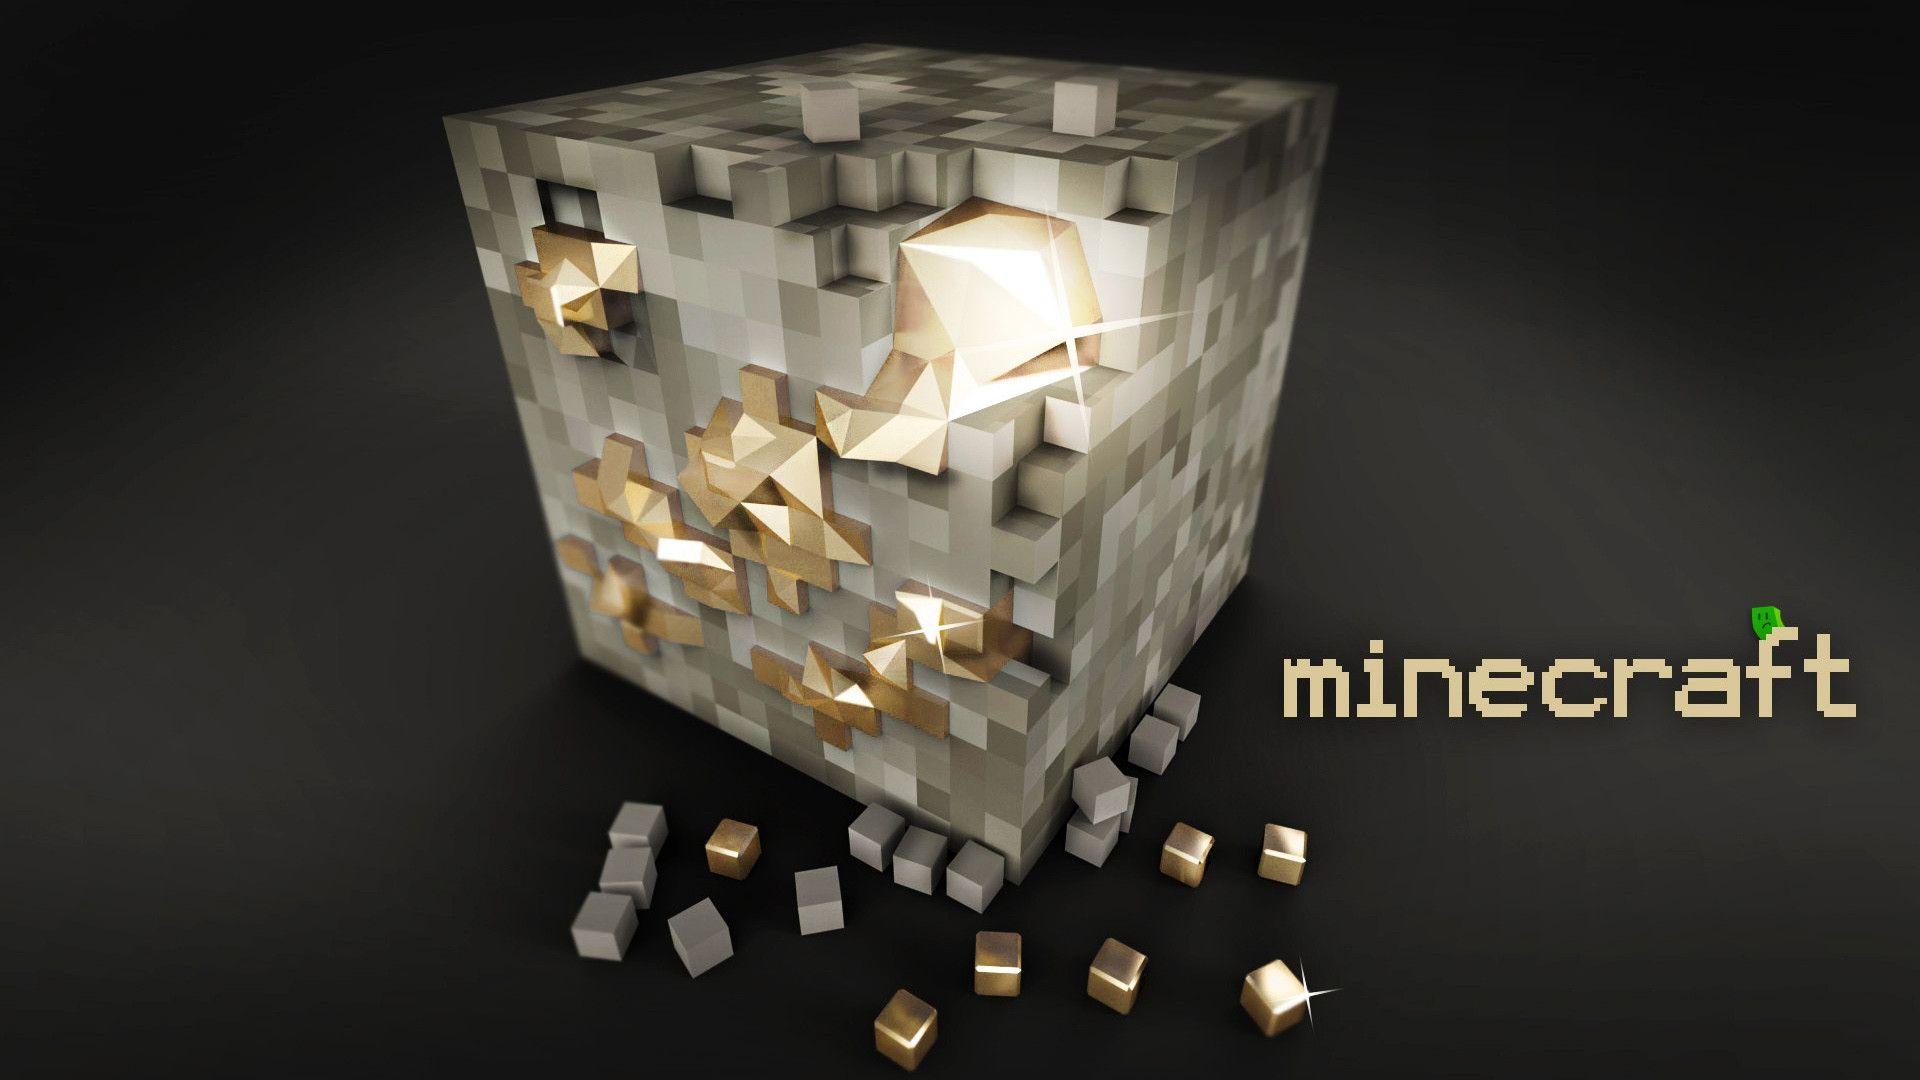 Minecraft Hd Wallpapers Desktop Backgrounds Mobile Wallpapers